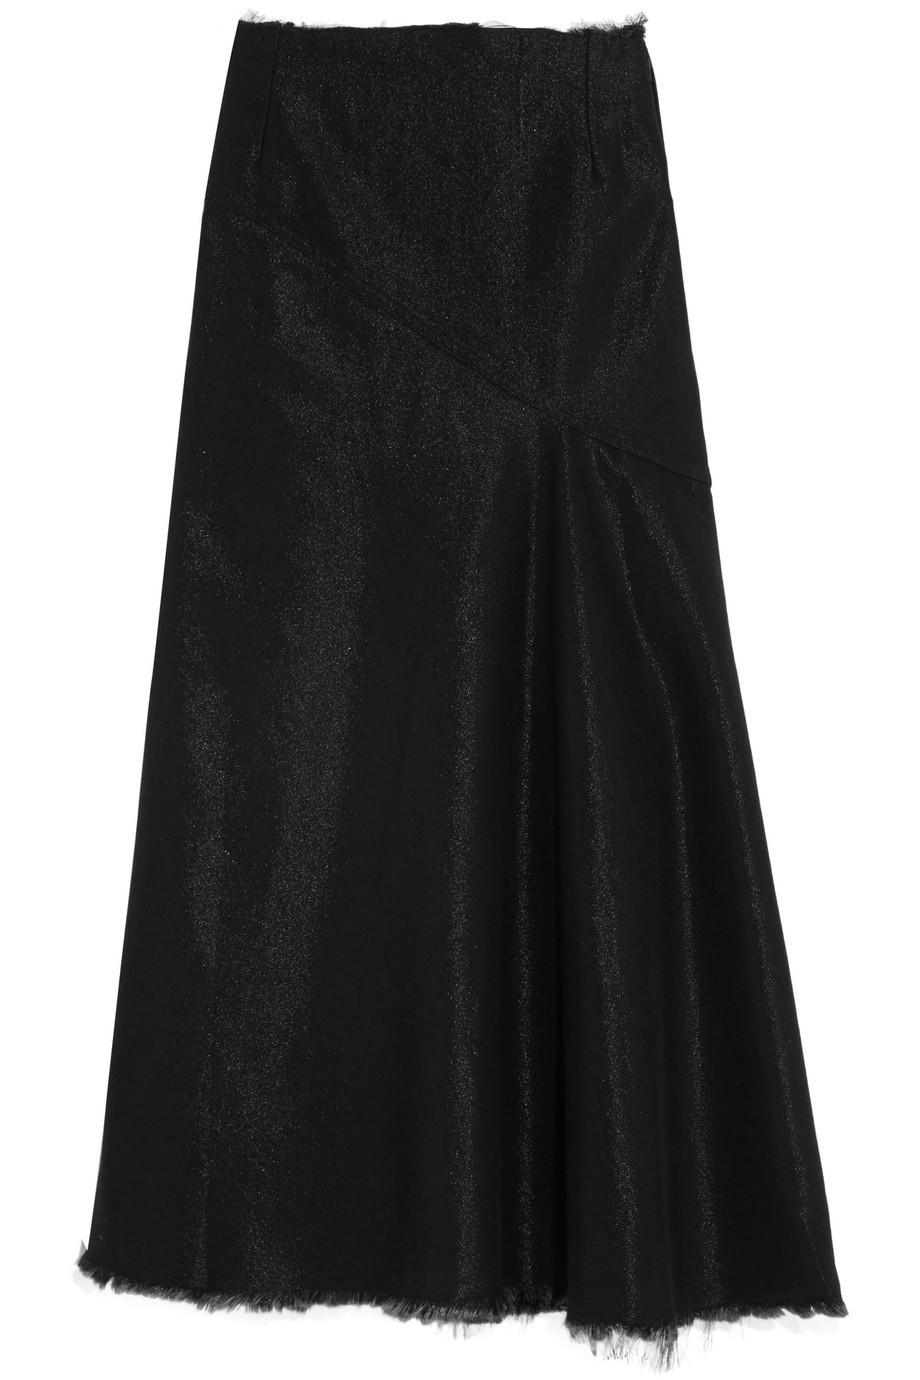 Frayed Metallic Denim Maxi Skirt, Marques' Almeida, Black, Women's, Size: 8